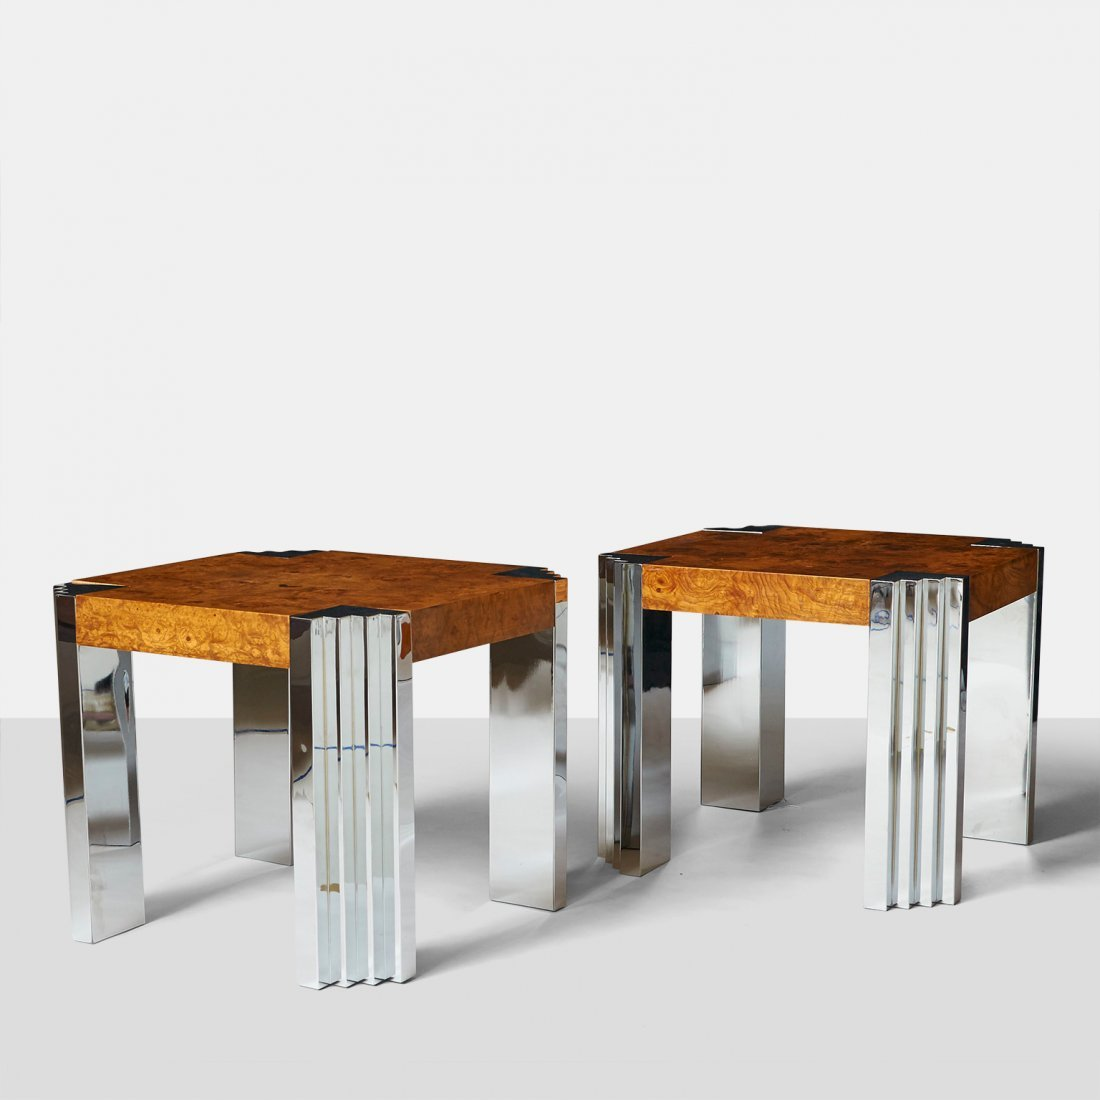 Milo Baughman, Pair of End Tables